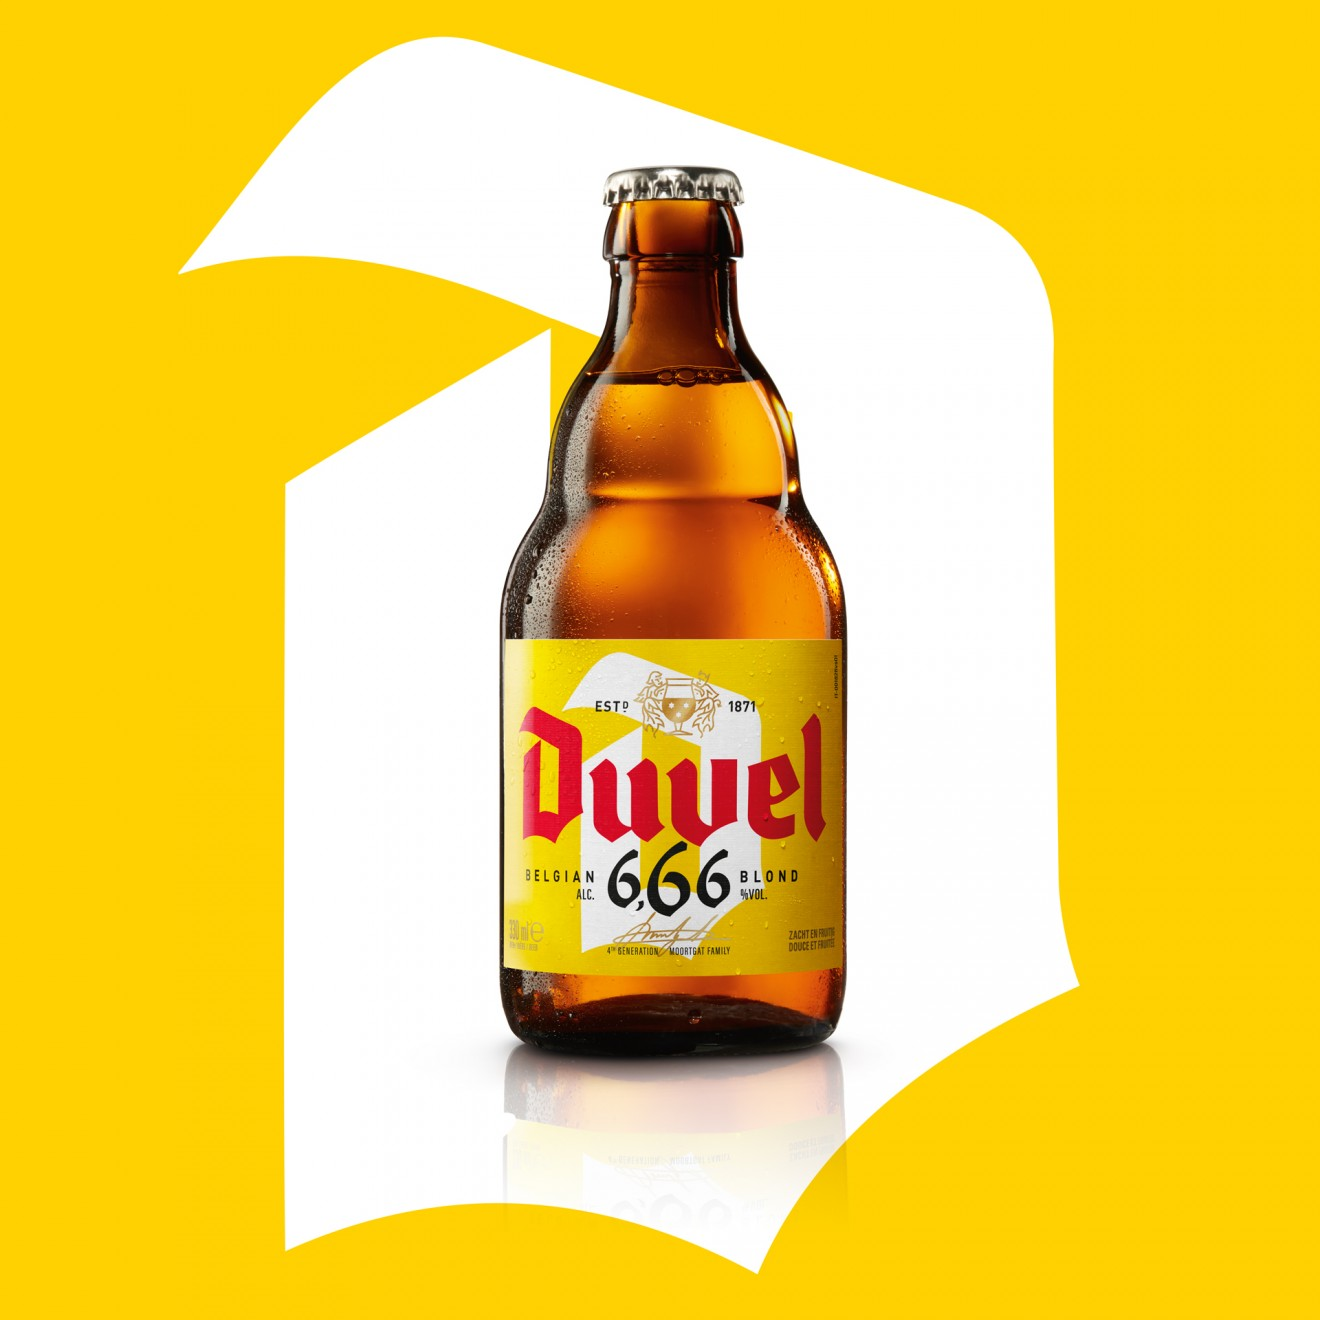 Quatre Mains package design - 666, beer, belgian